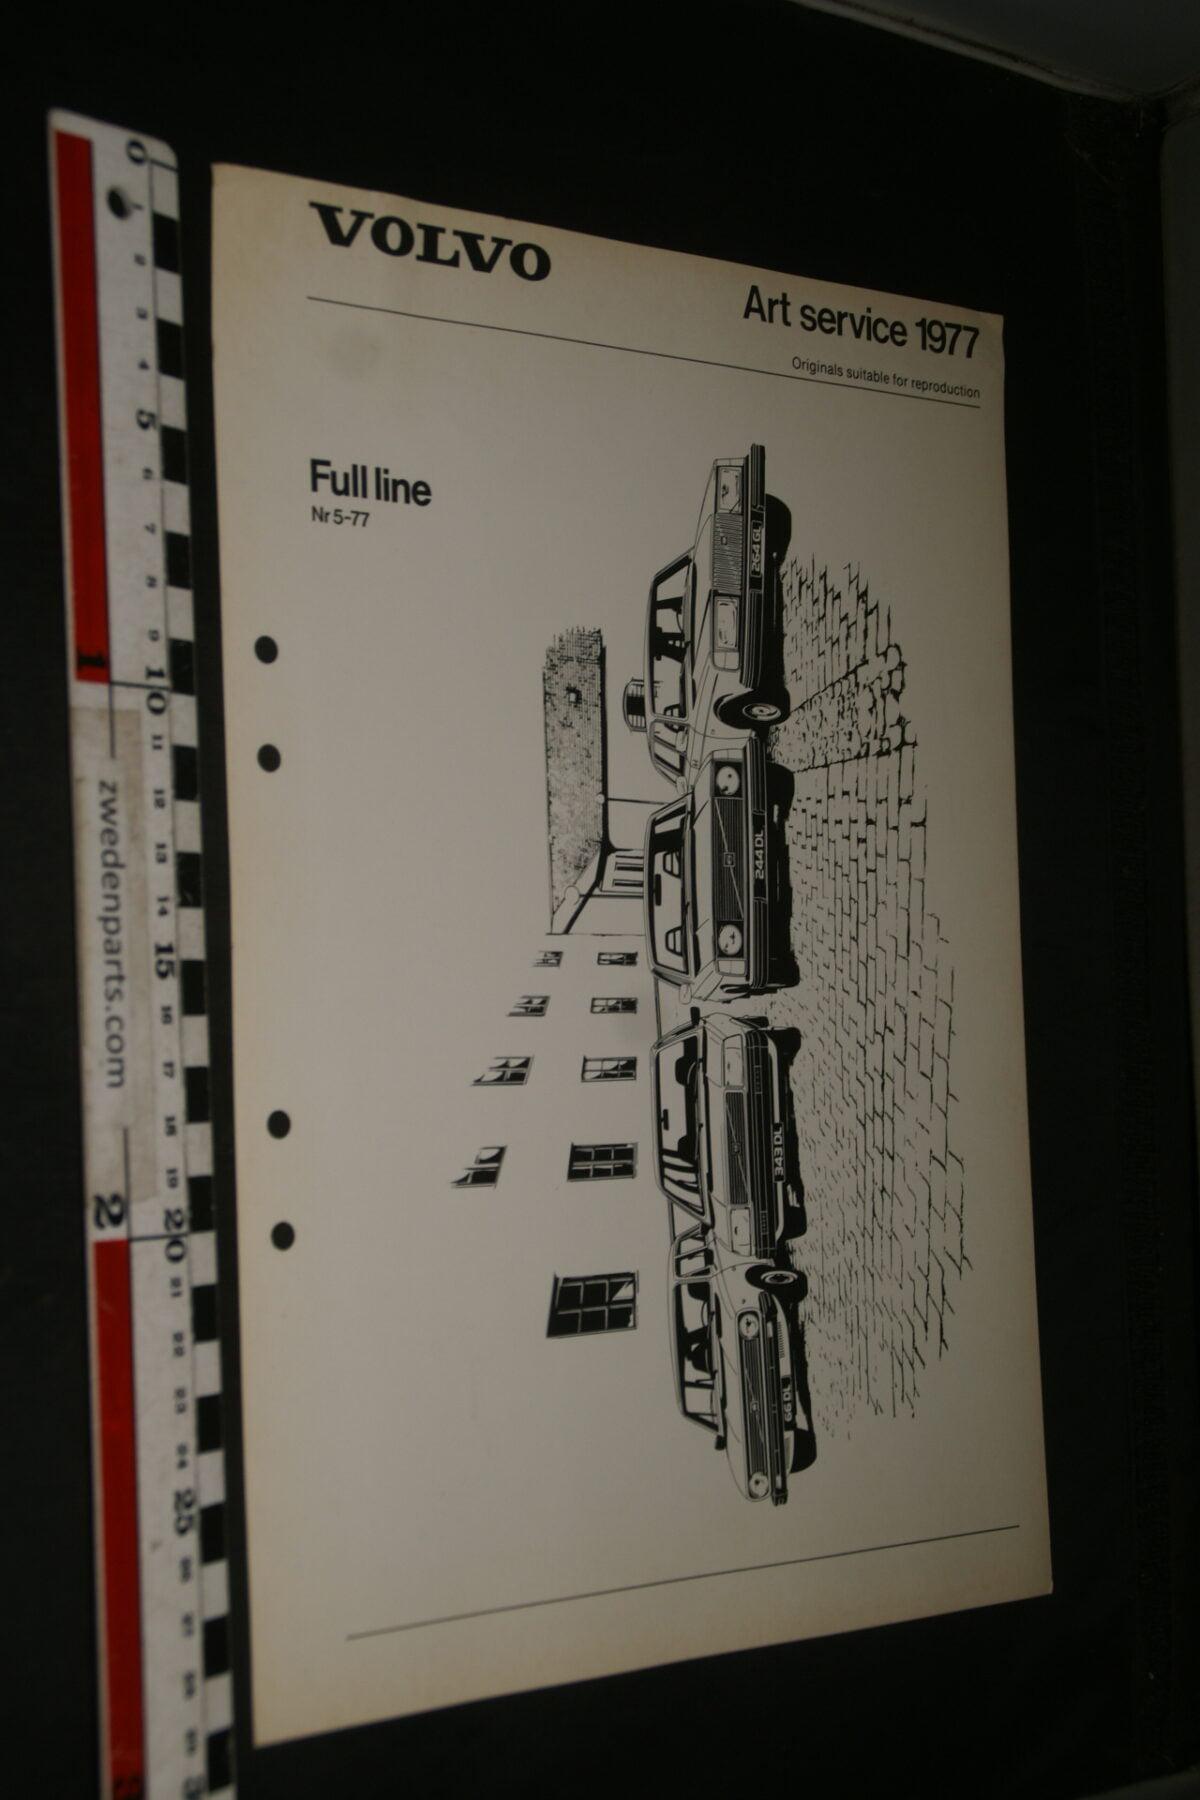 DSC03282 1977 originele plaat op zwaar papier Volvo Full line nr 5-77-91b704fa